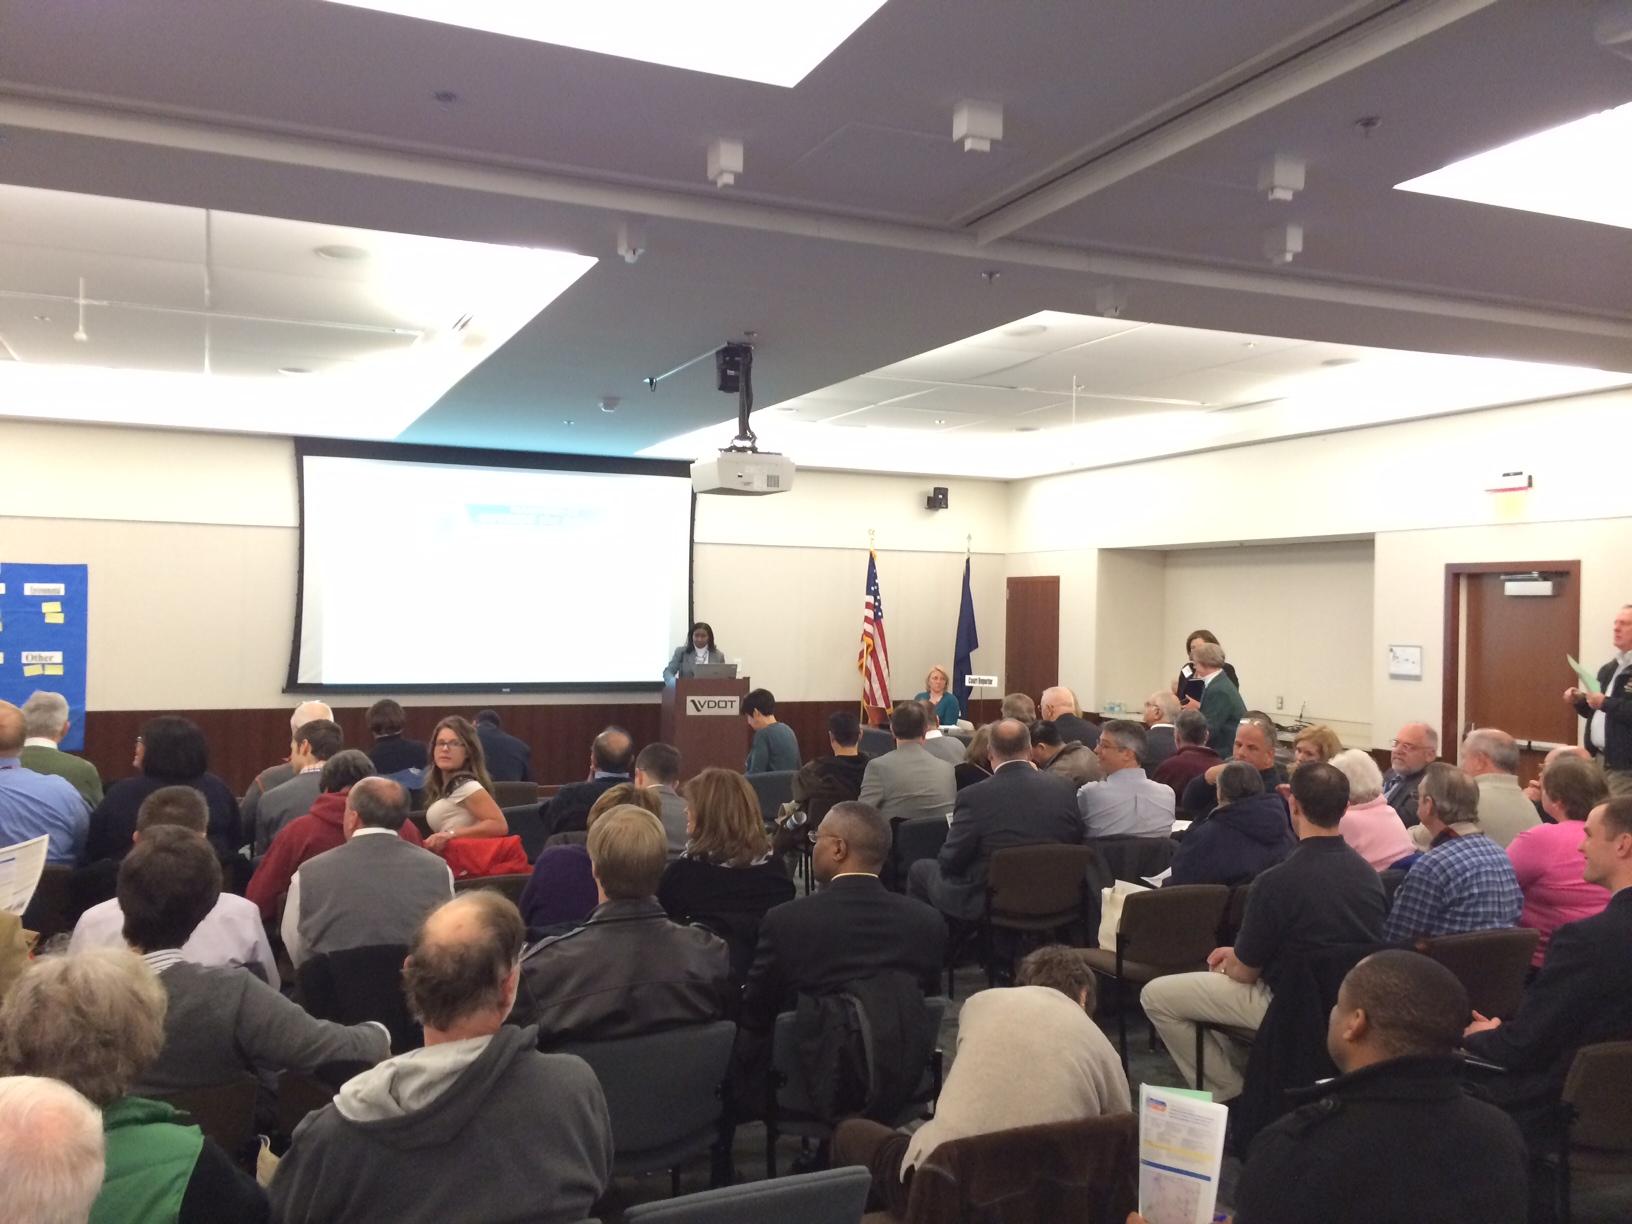 Public meeting held on widening I-66, adding tolls